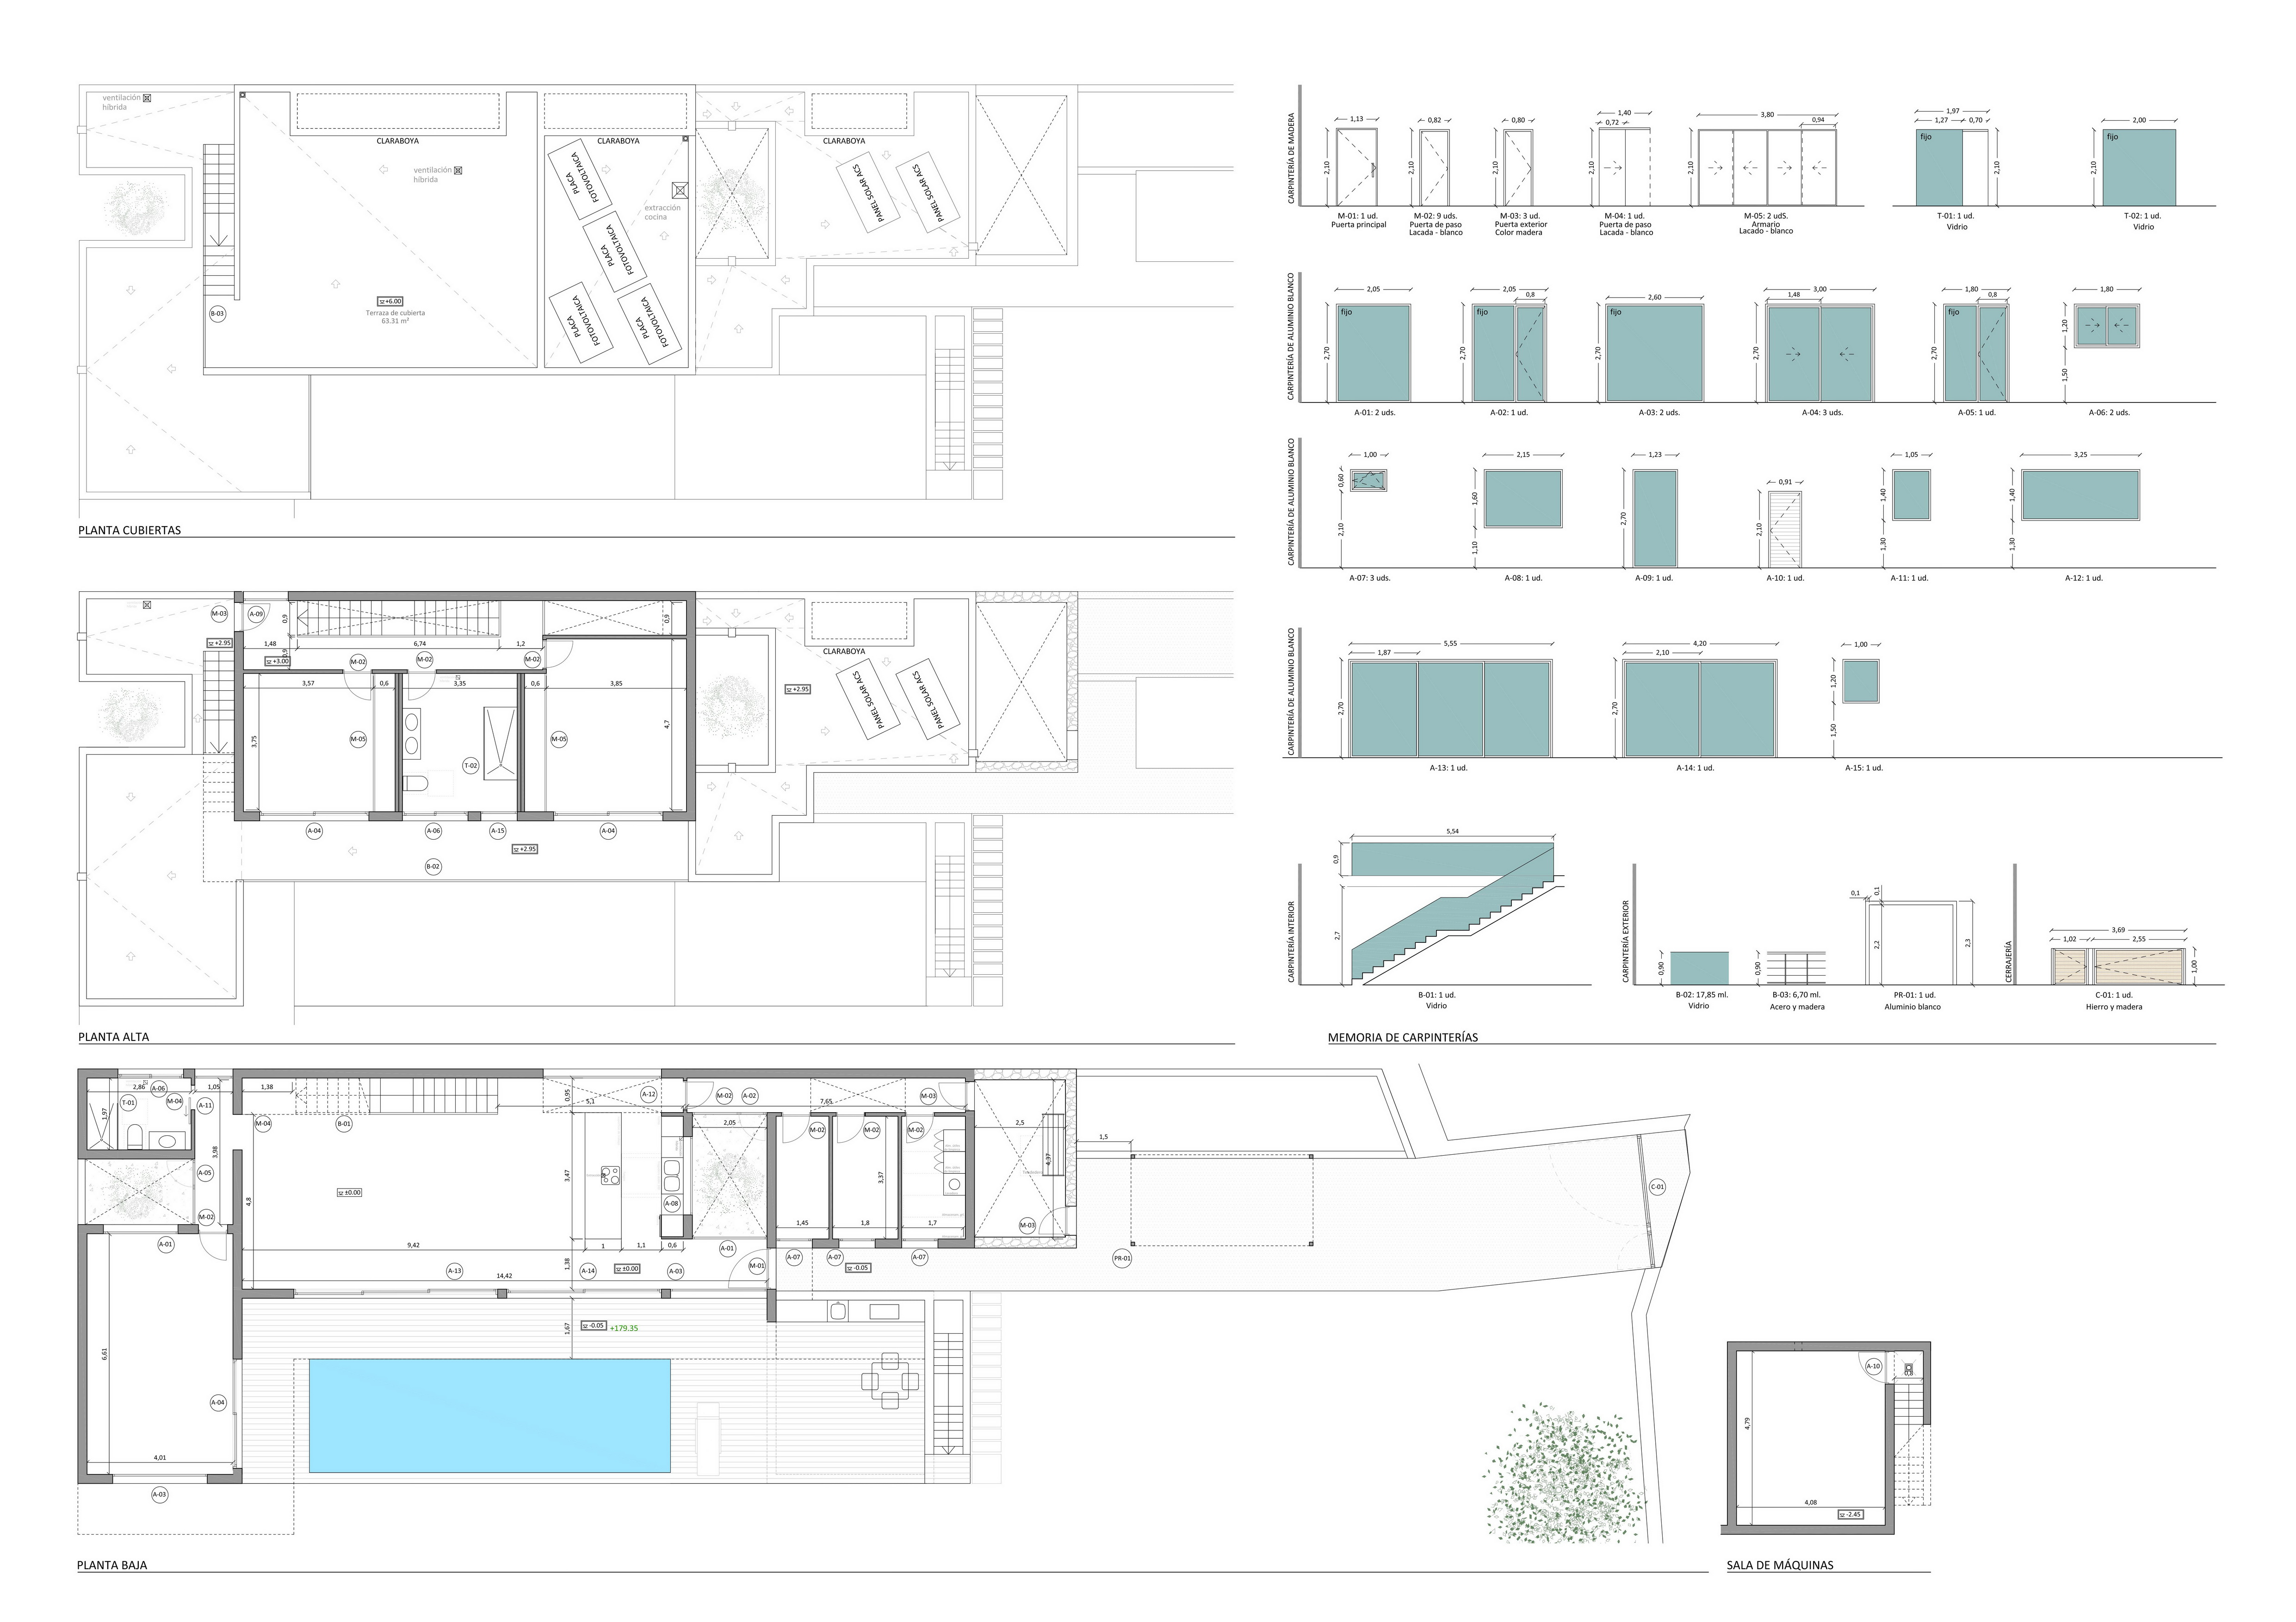 Plans EA 1910 4 Cotas Mem carpinterías